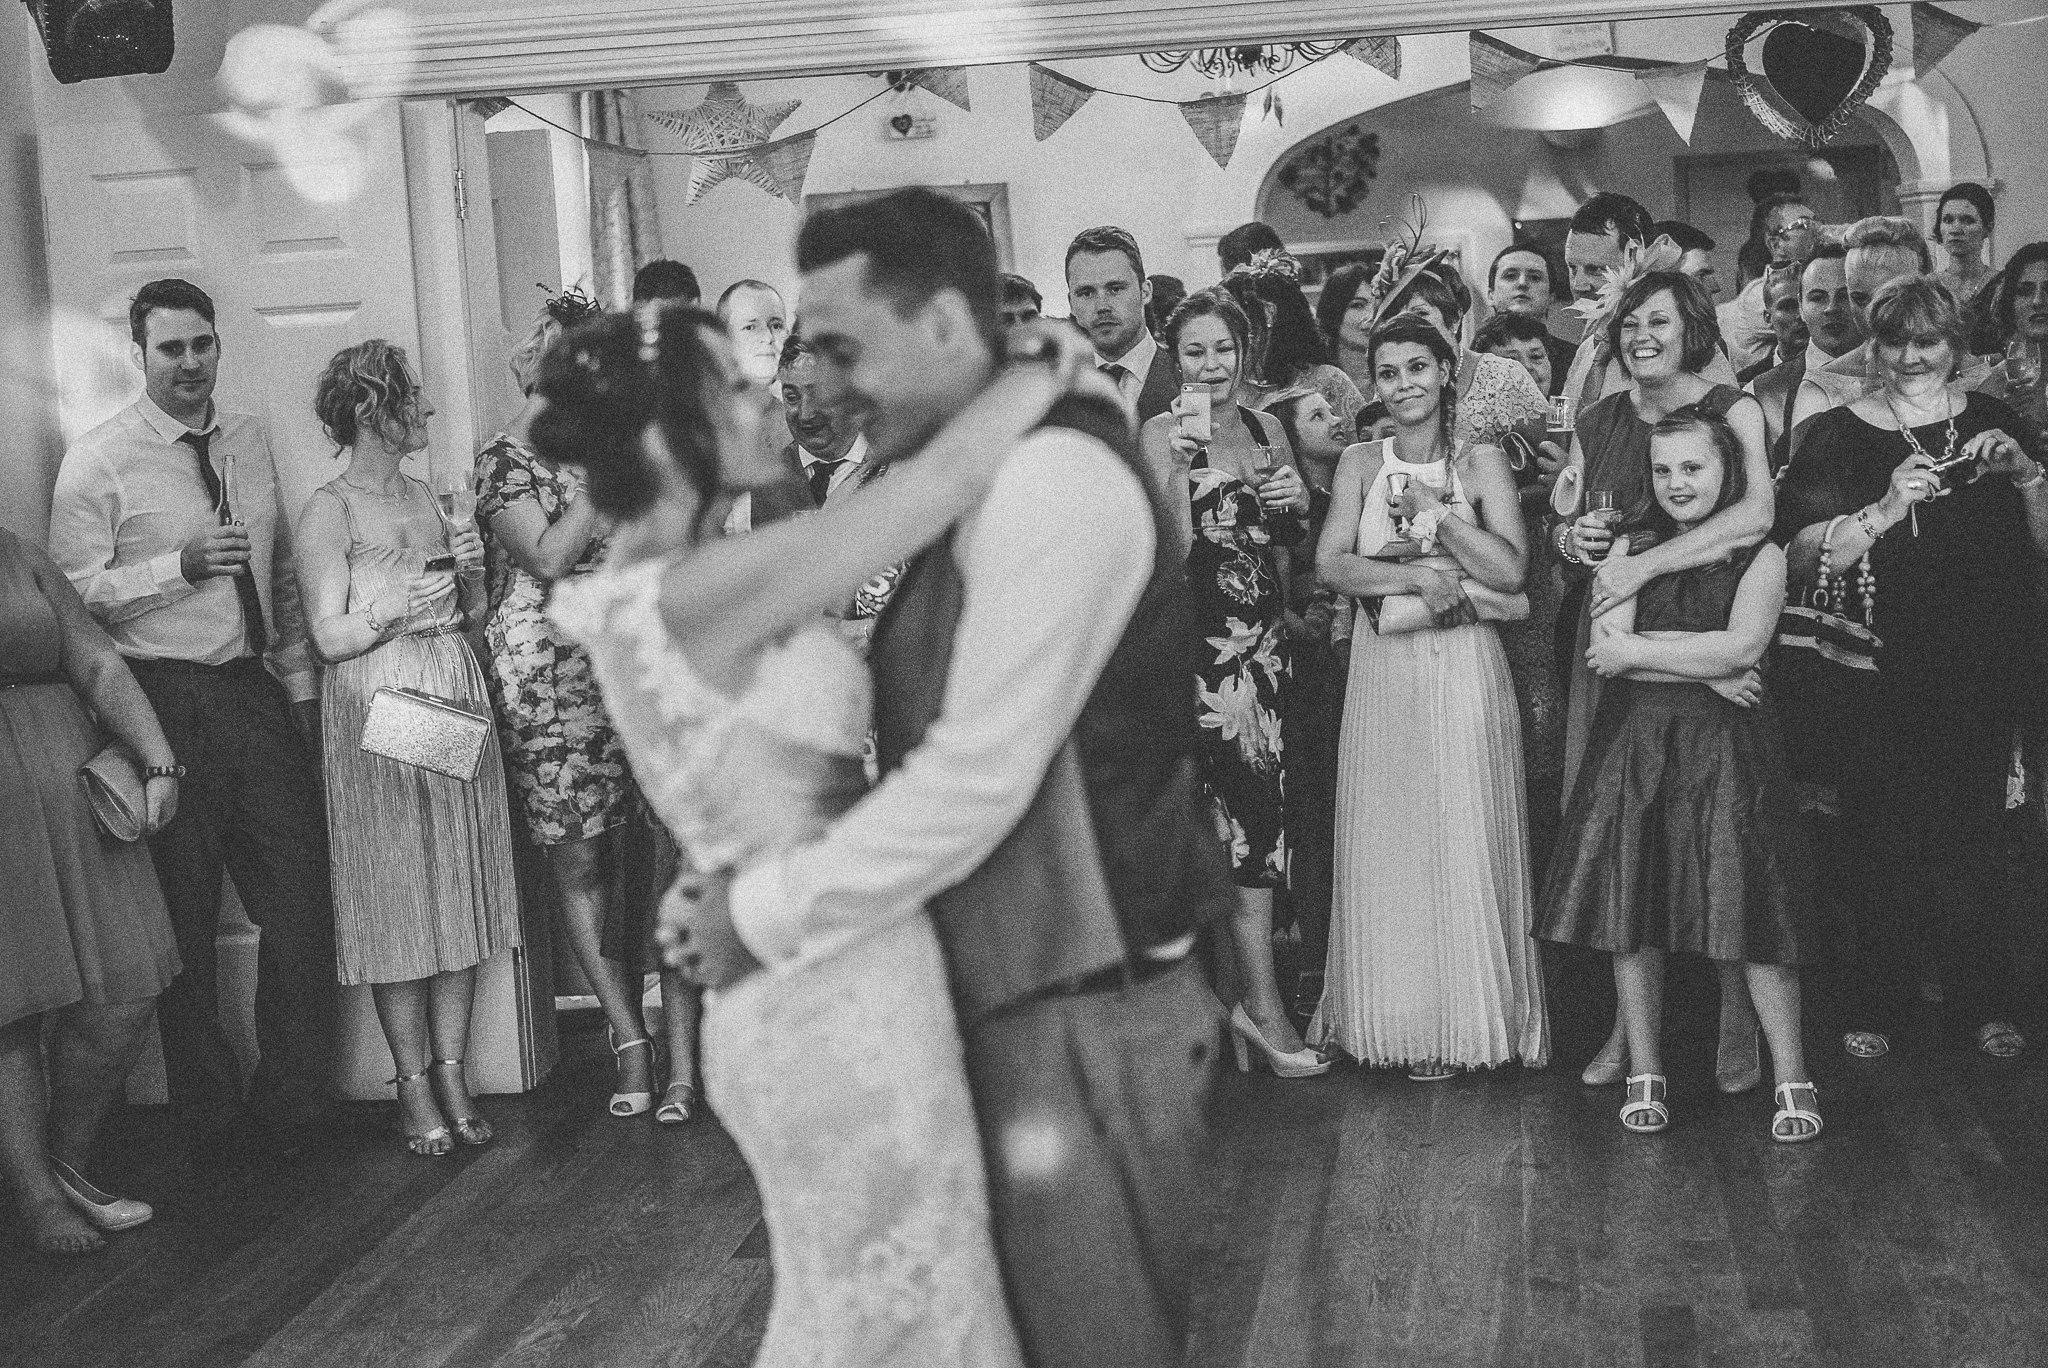 paul-marbrook-Caer-Llan-Wedding-Photographer-90091